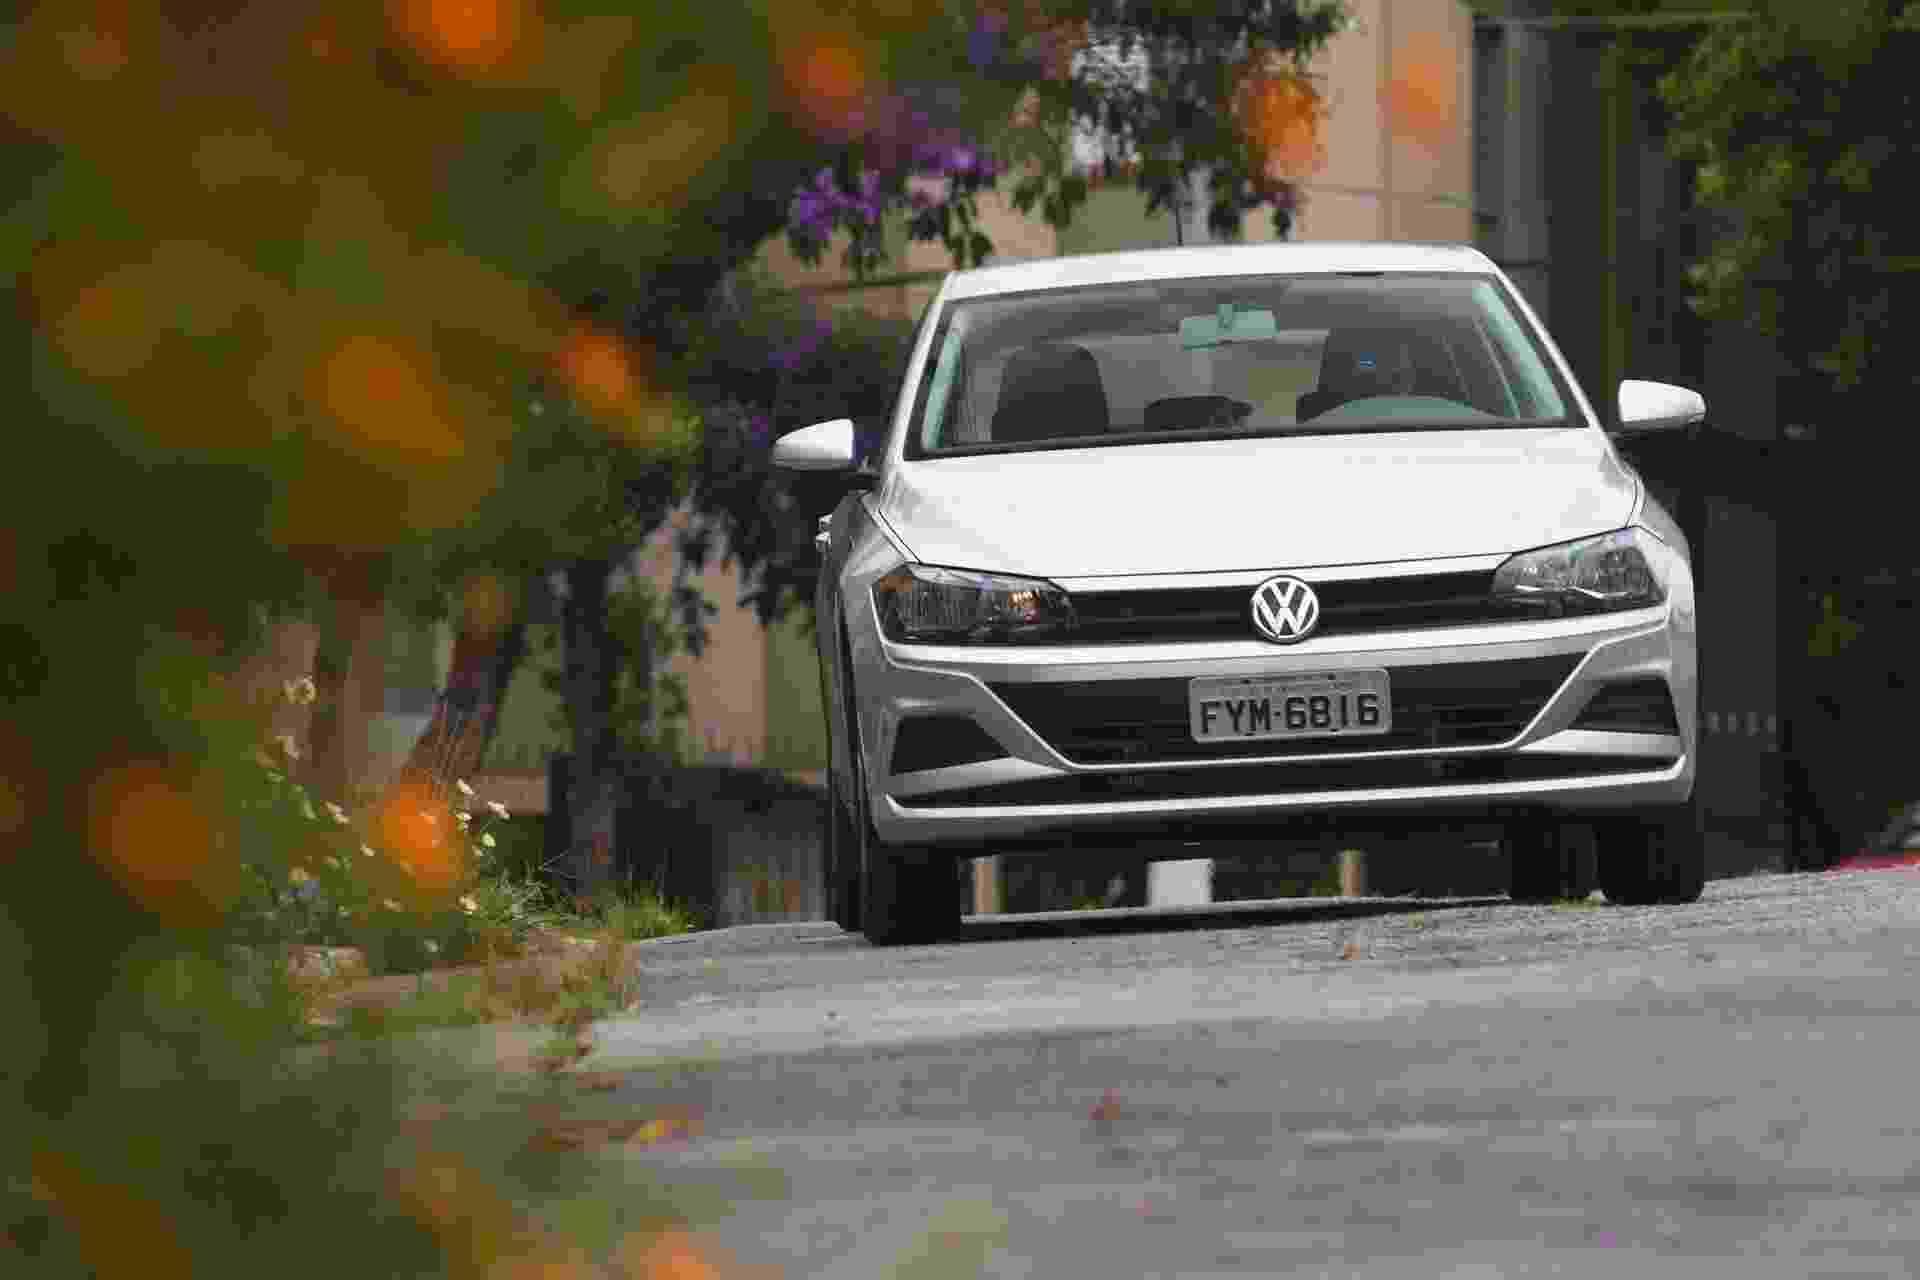 Volkswagen Polo - Murilo Góes/UOL